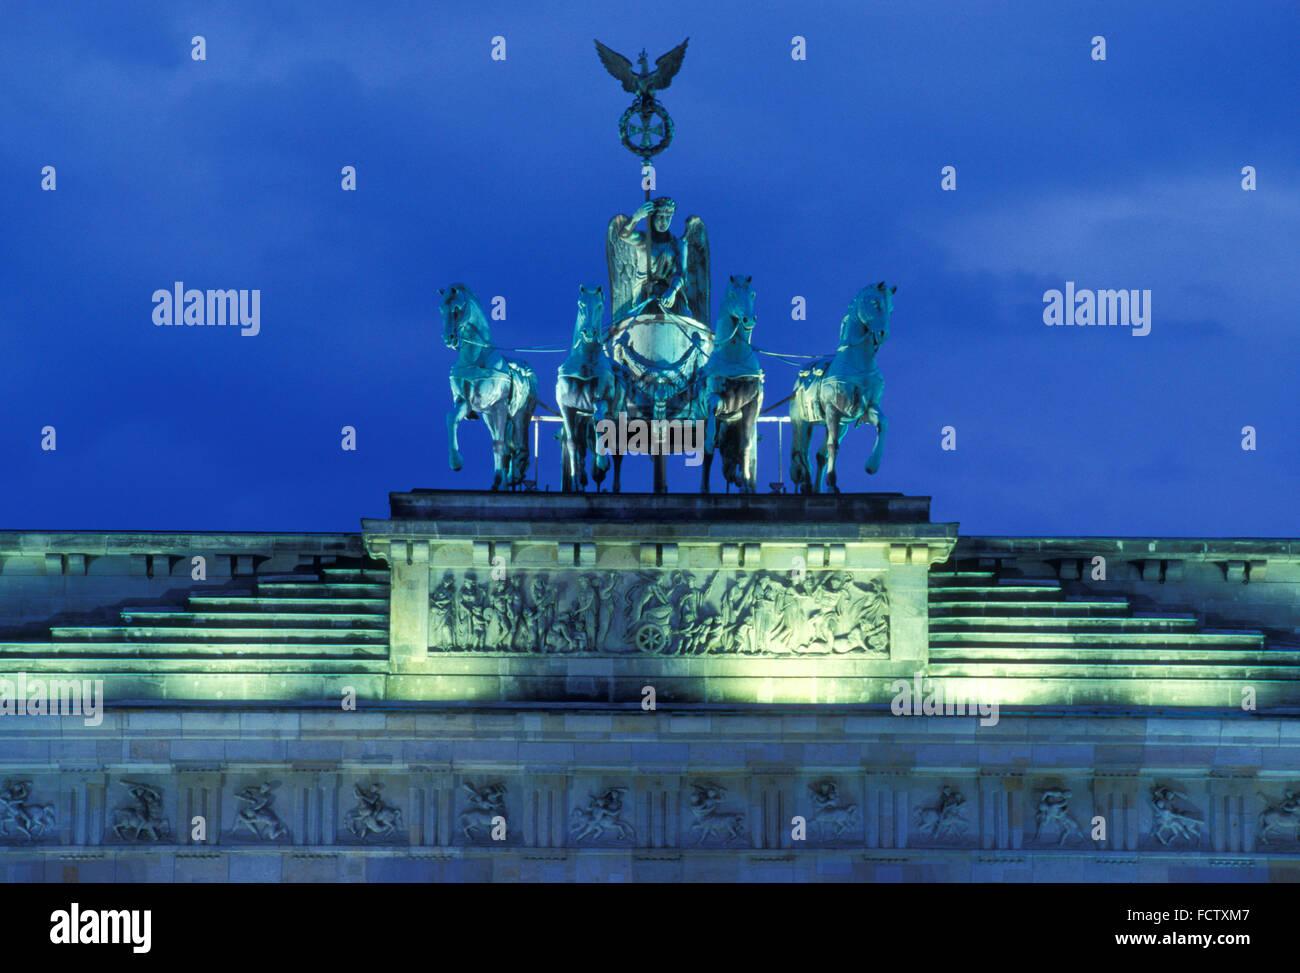 L'Europe, Allemagne, Berlin, le quadrige de la porte de Brandebourg. Europa, Deutschland, Berlin, die Quadriga Photo Stock